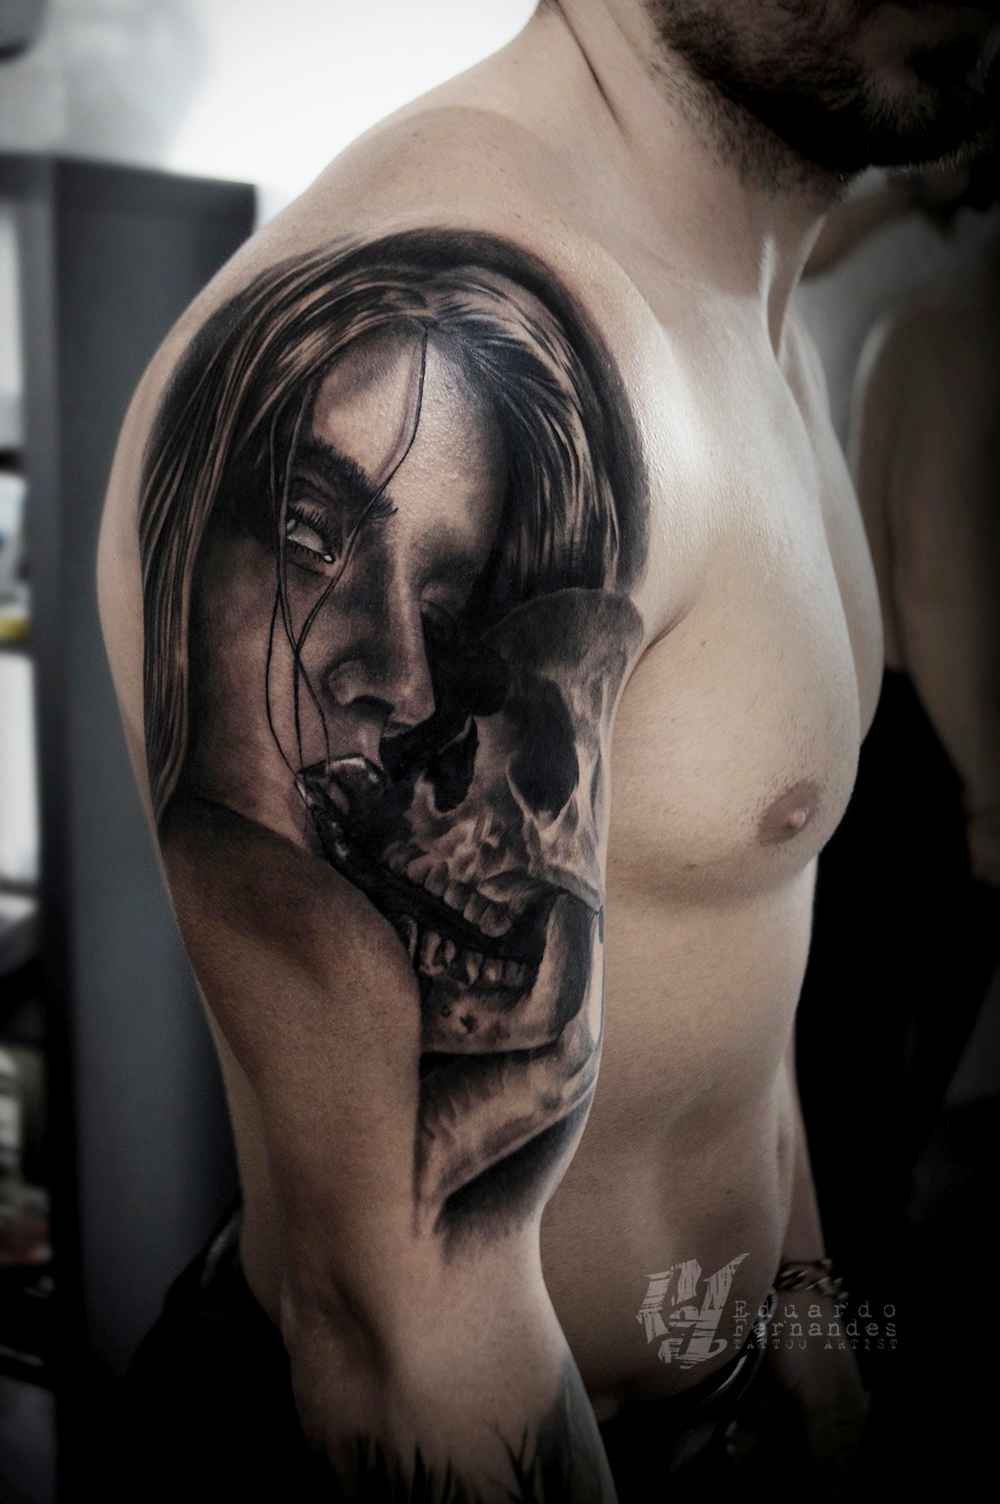 Tattoo rock festival day 2 realism tattoos eduardo fernandes tatuagem realista altavistaventures Gallery